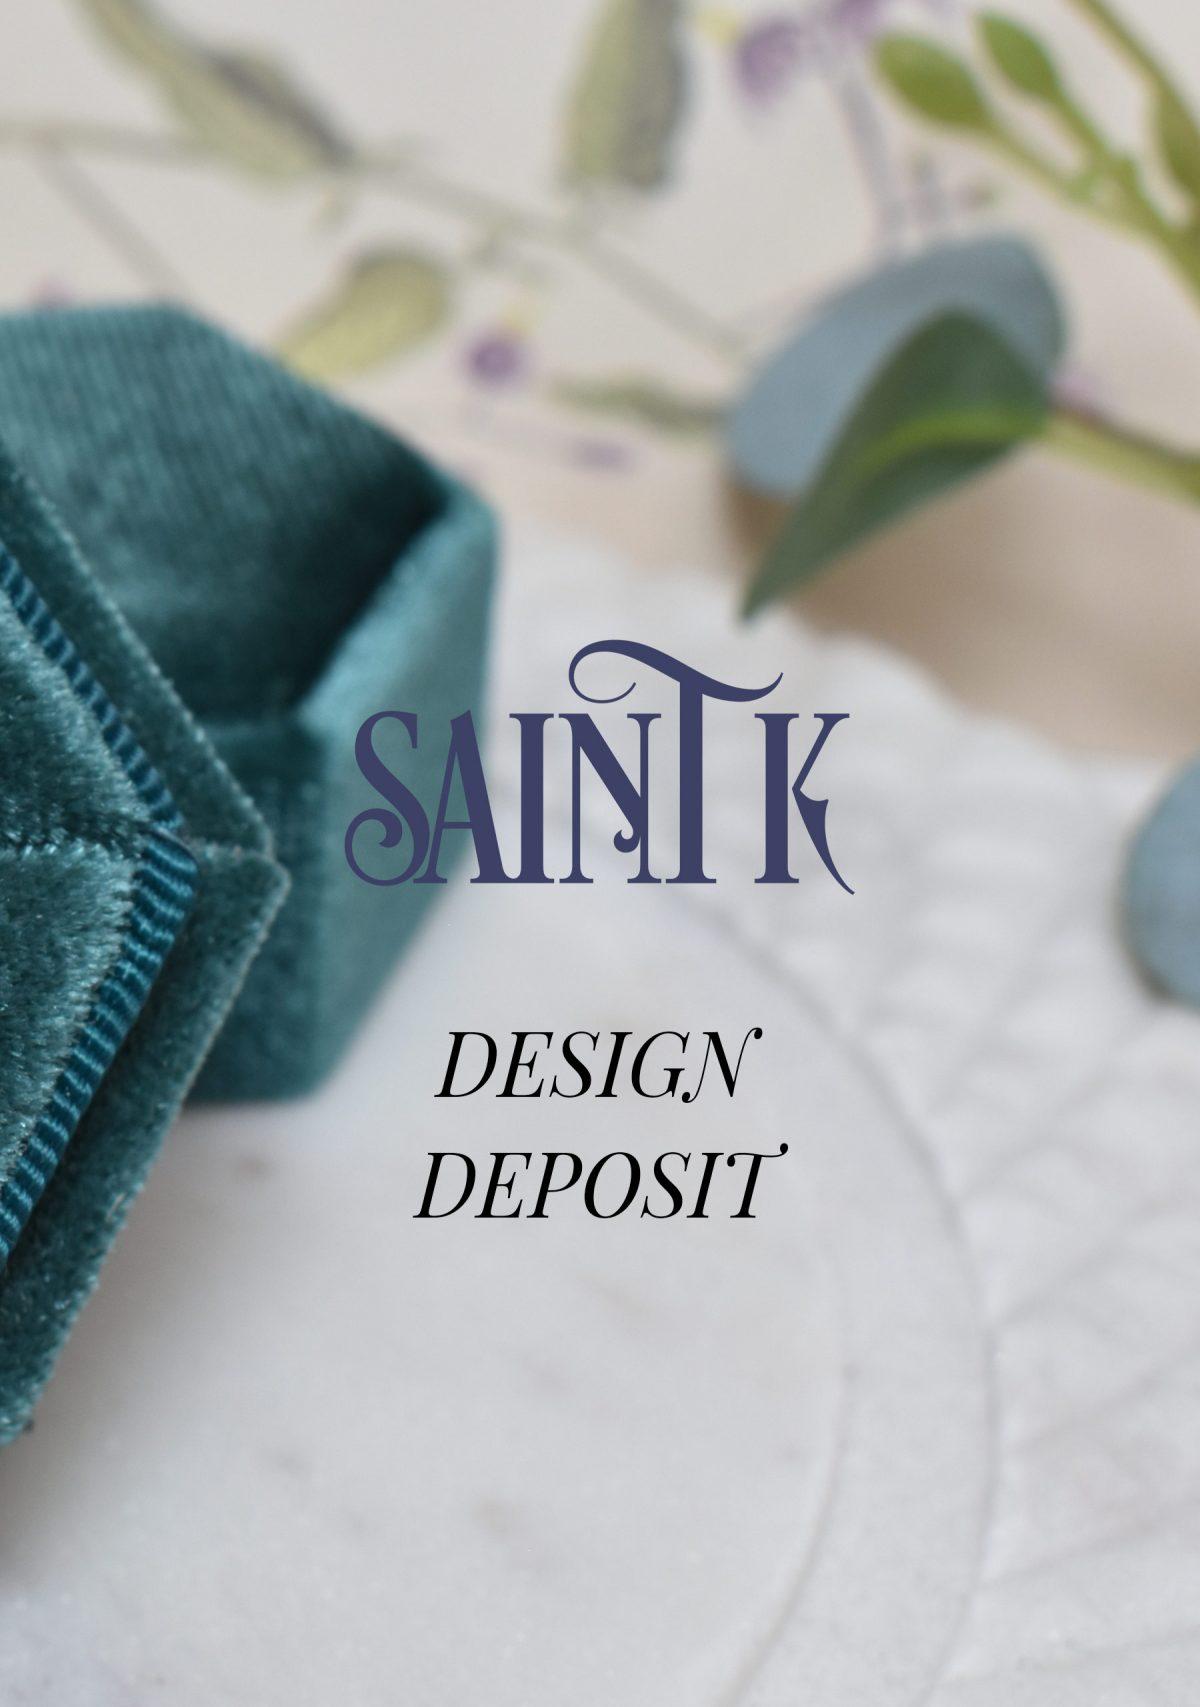 Saint K Design Deposit